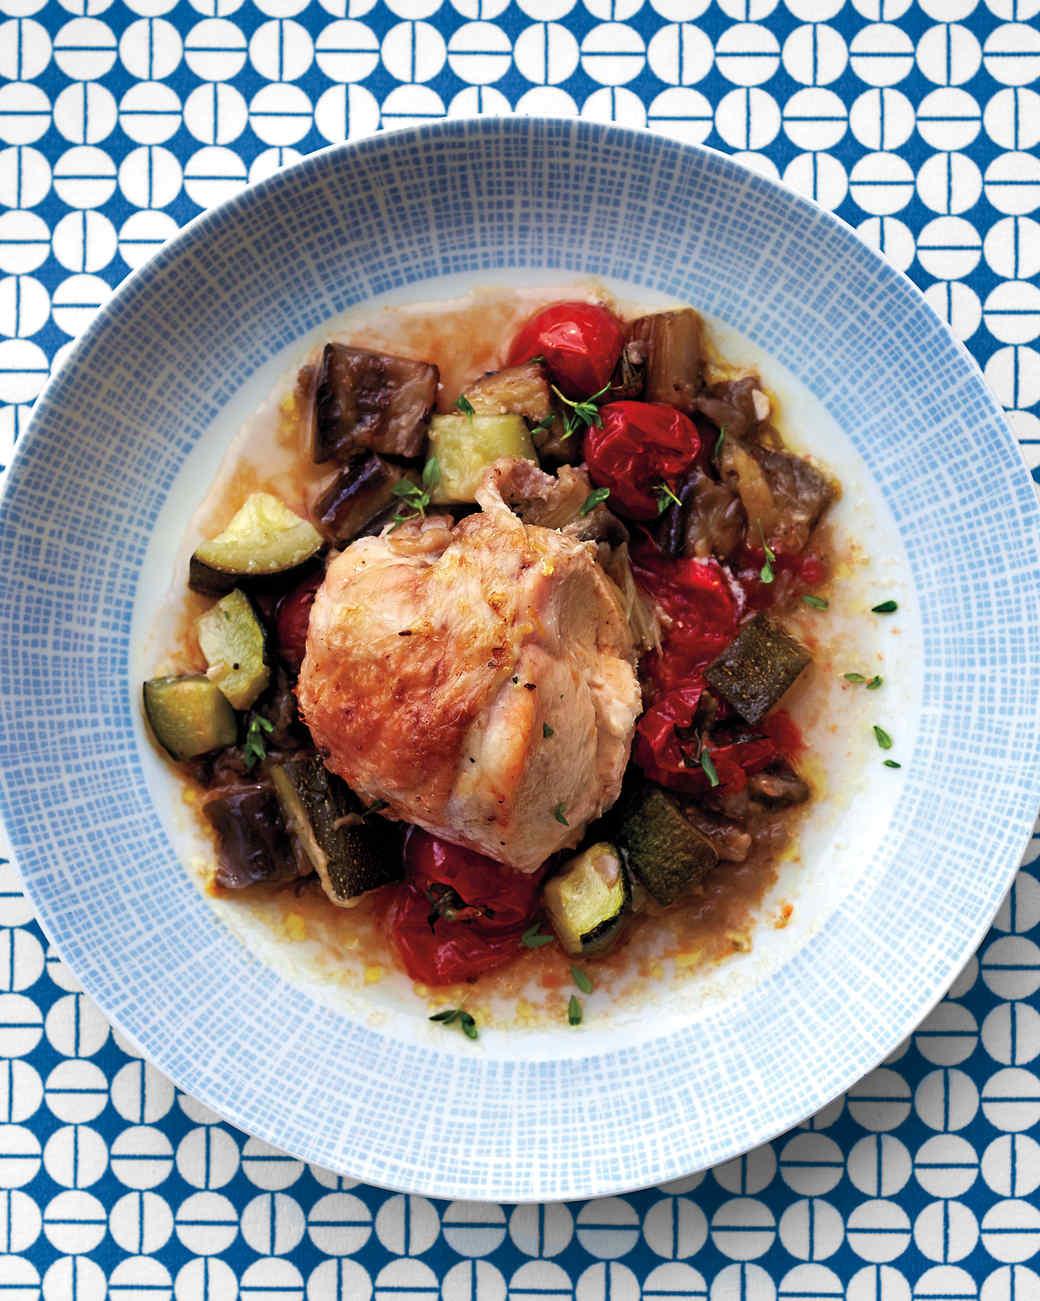 chicken-plated-193-d111921.jpg